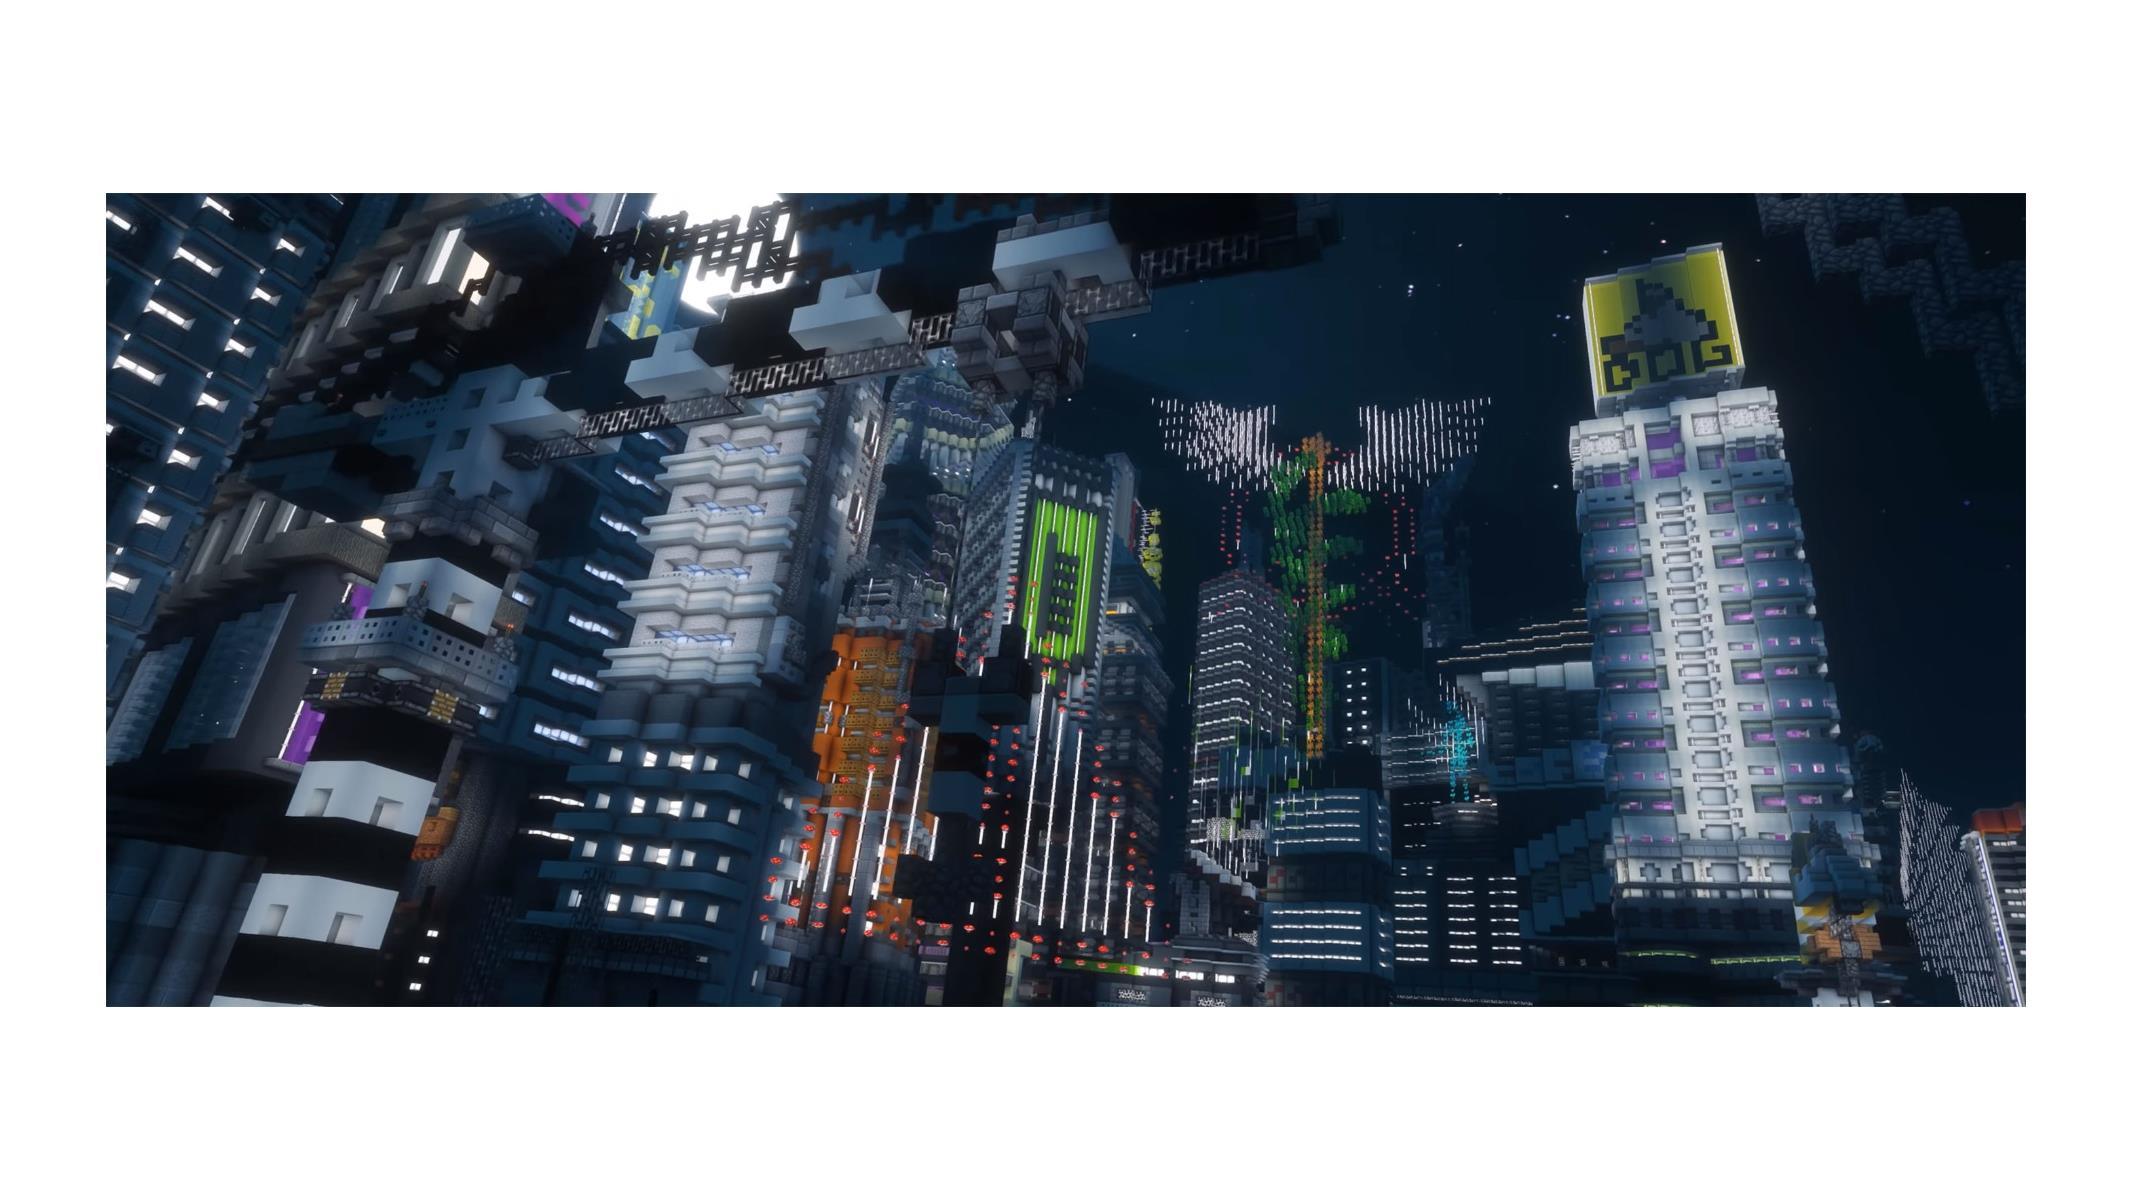 Minecraft Enthusiasts Build A Fantastic Cyberpunk 2077